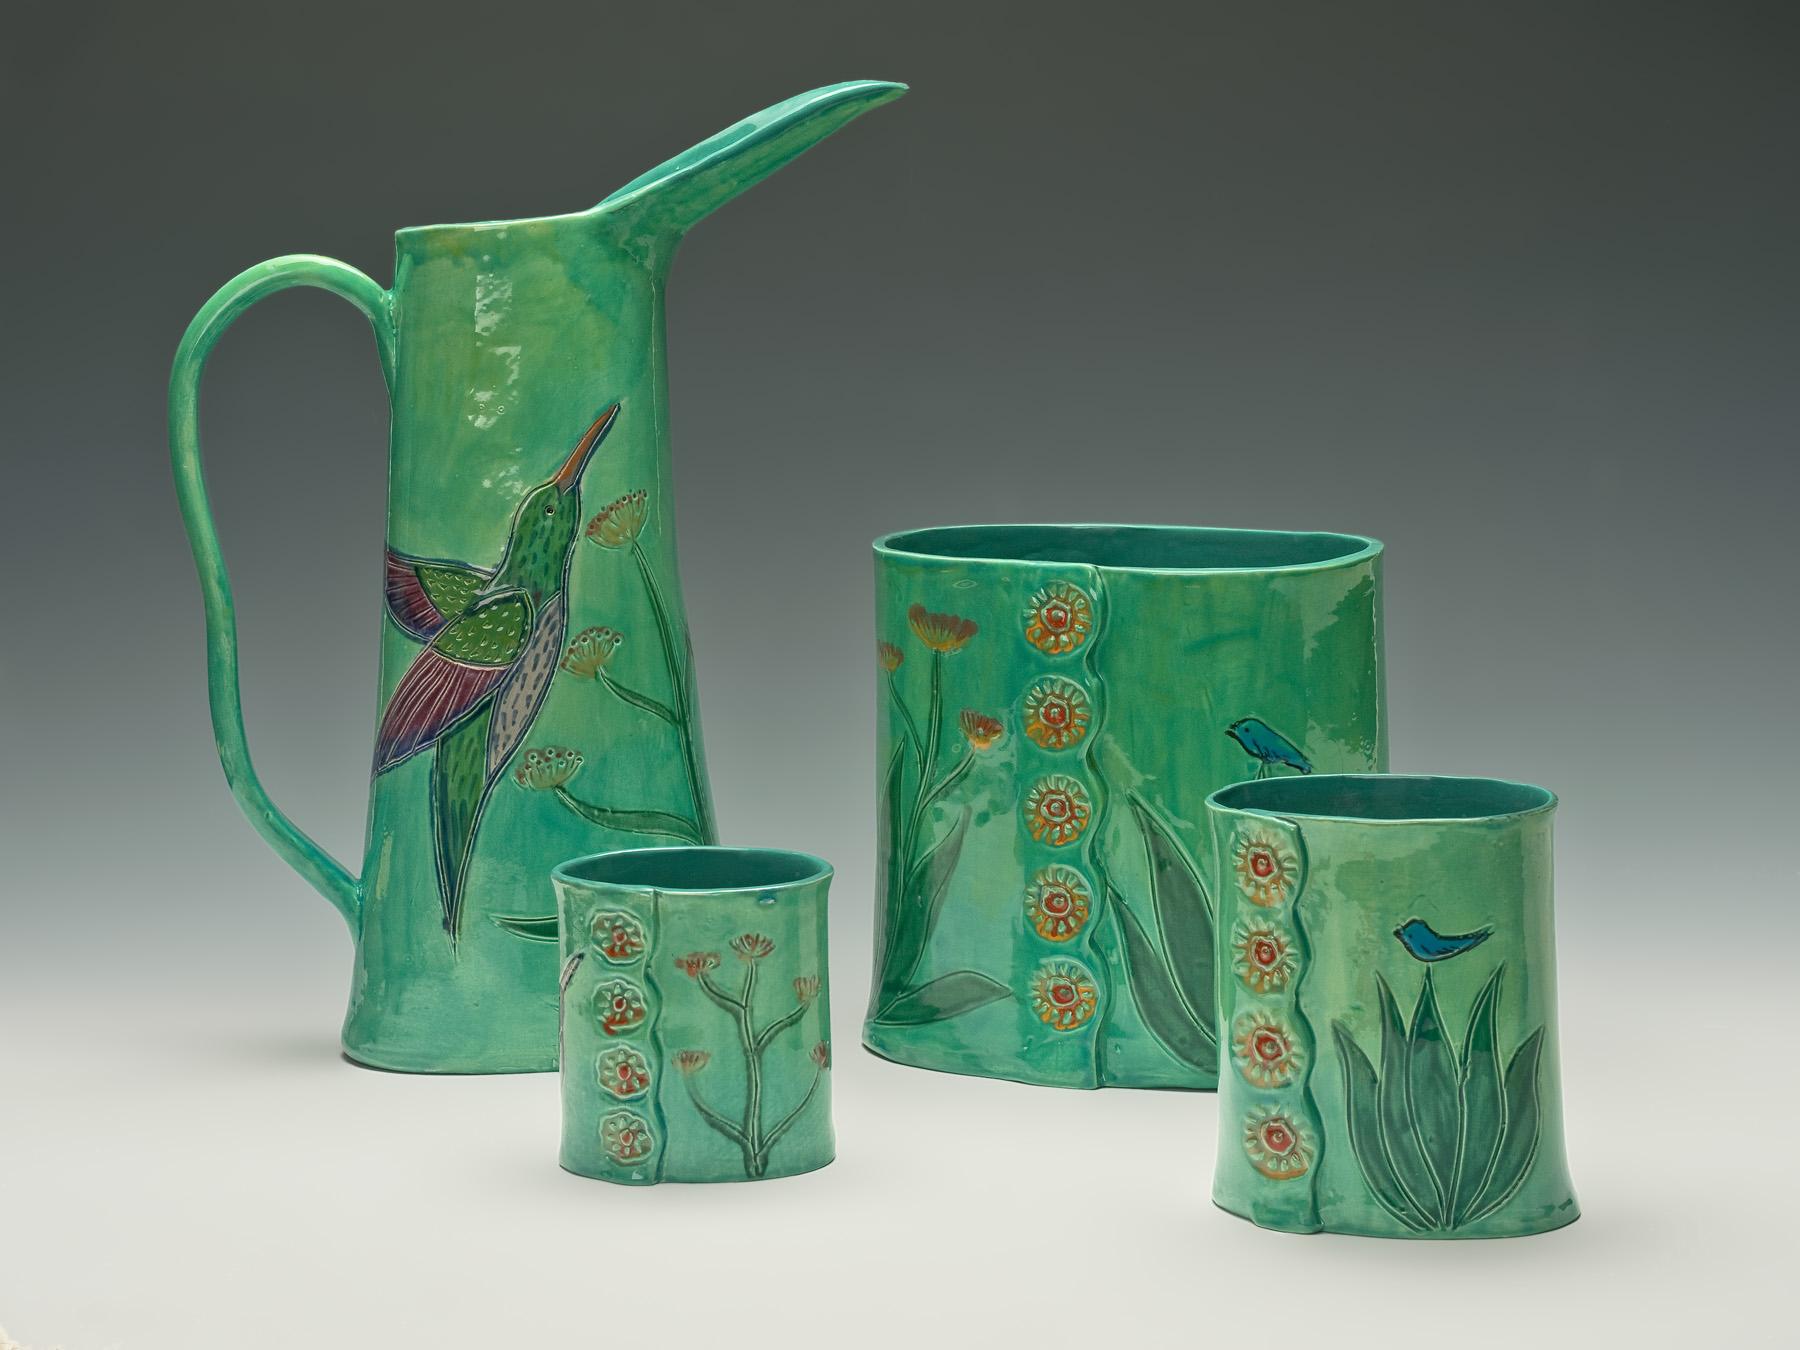 Robin Chlad Designs 3 Dimensional Mosaics Vibrant